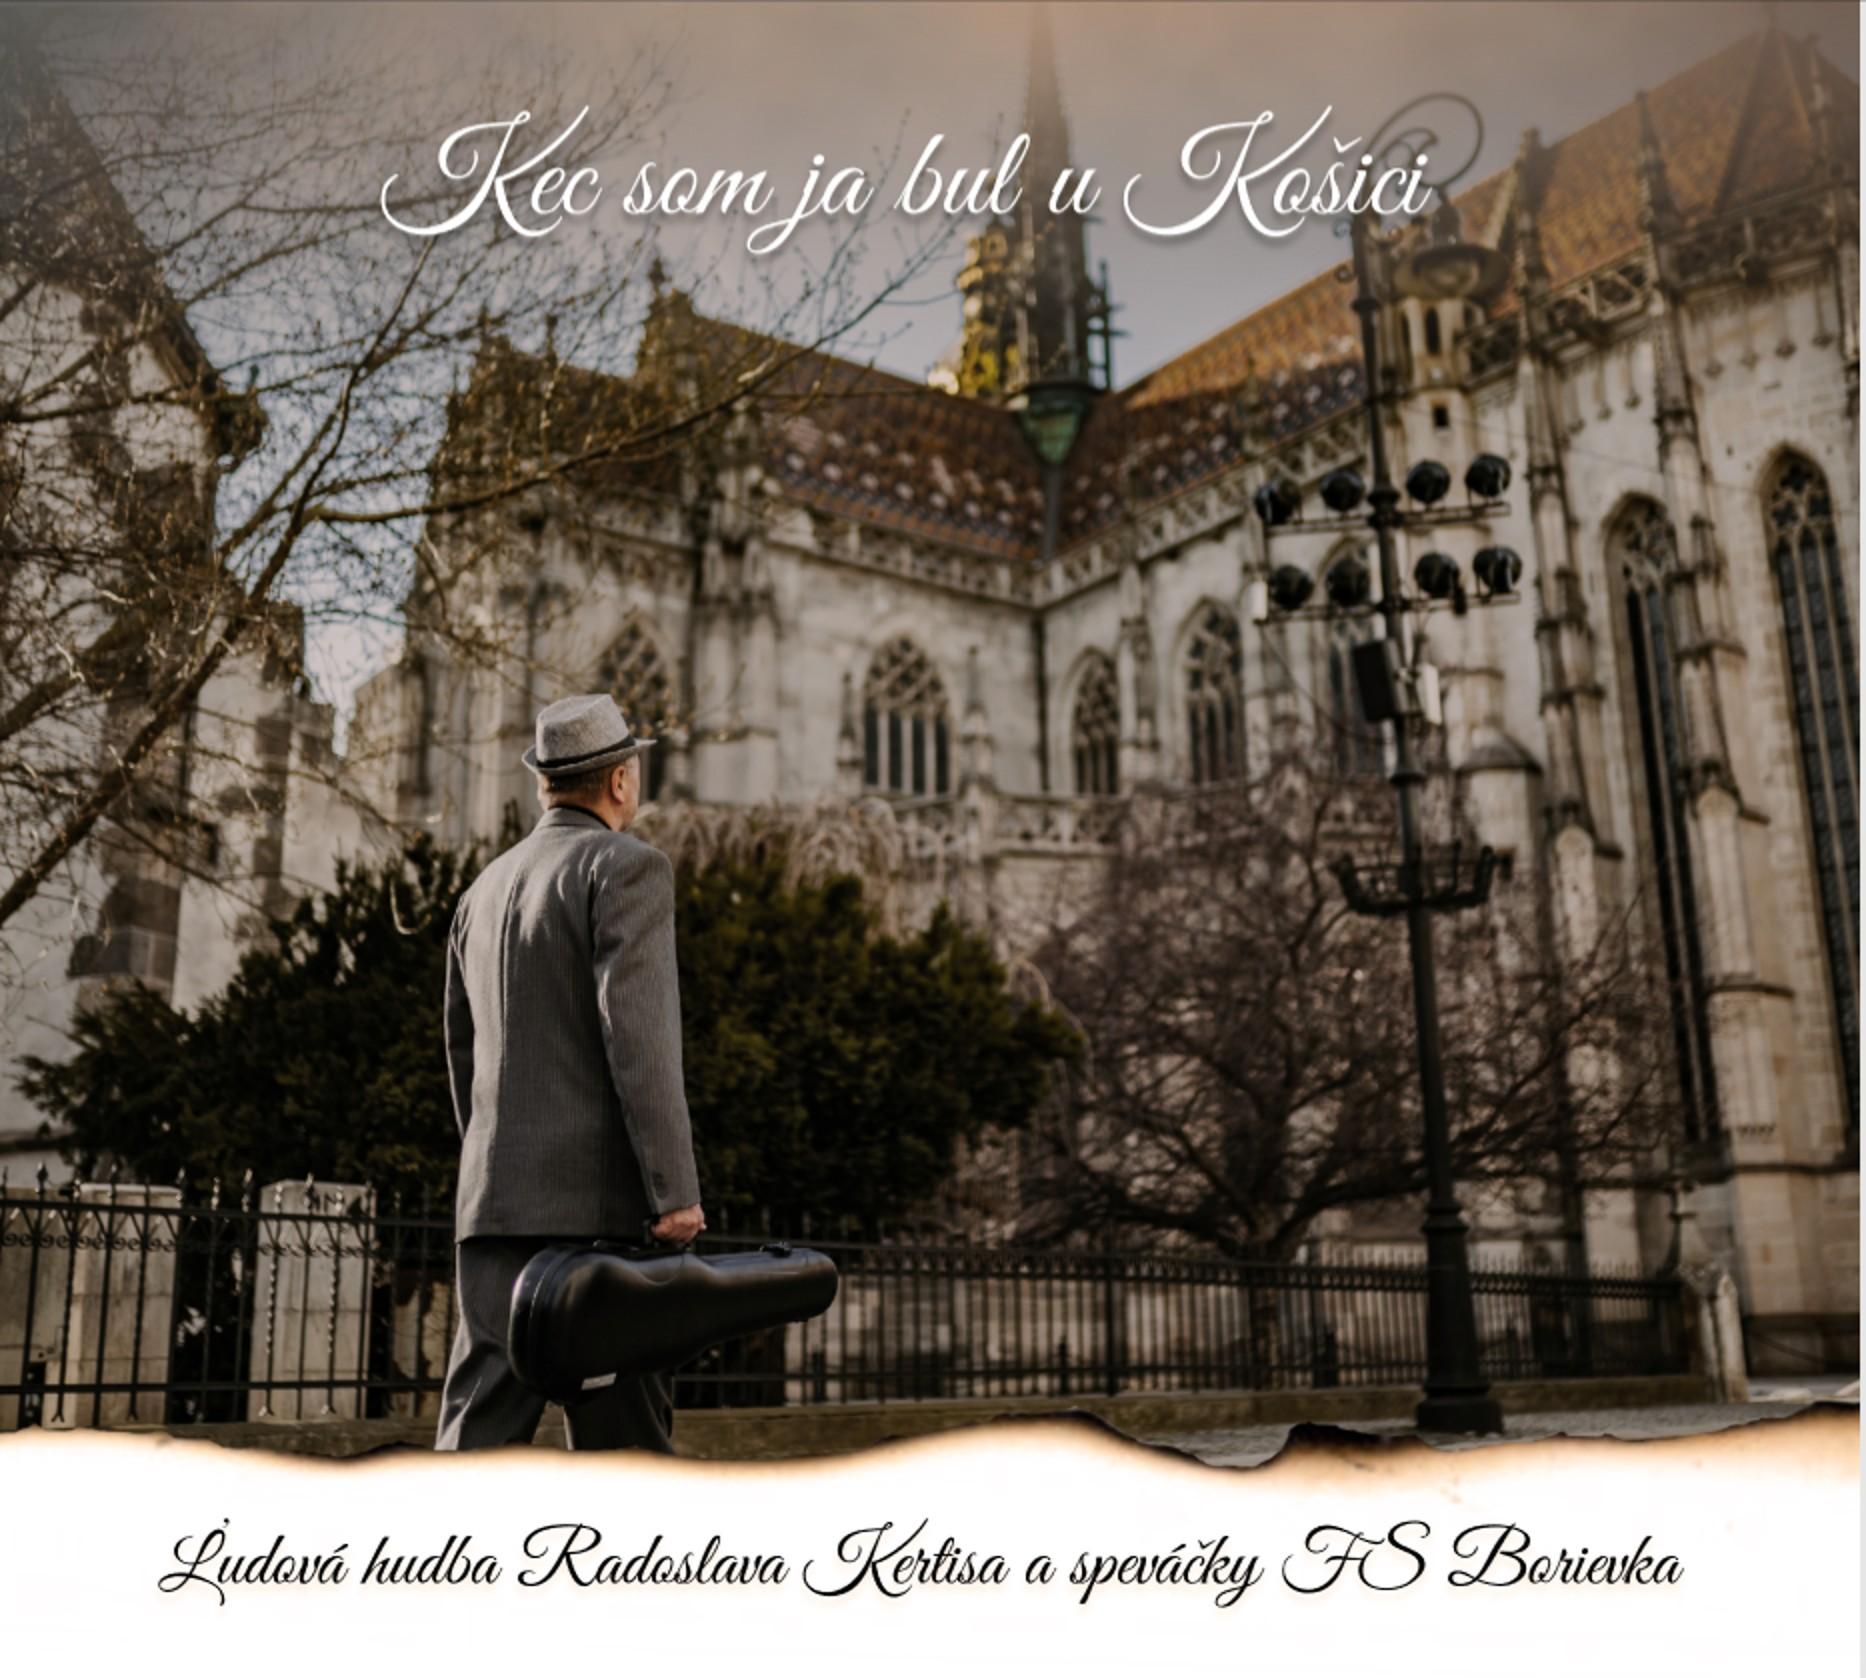 Ľudová hudba Rada Kertisa - CD Kec som ja bul u Košici